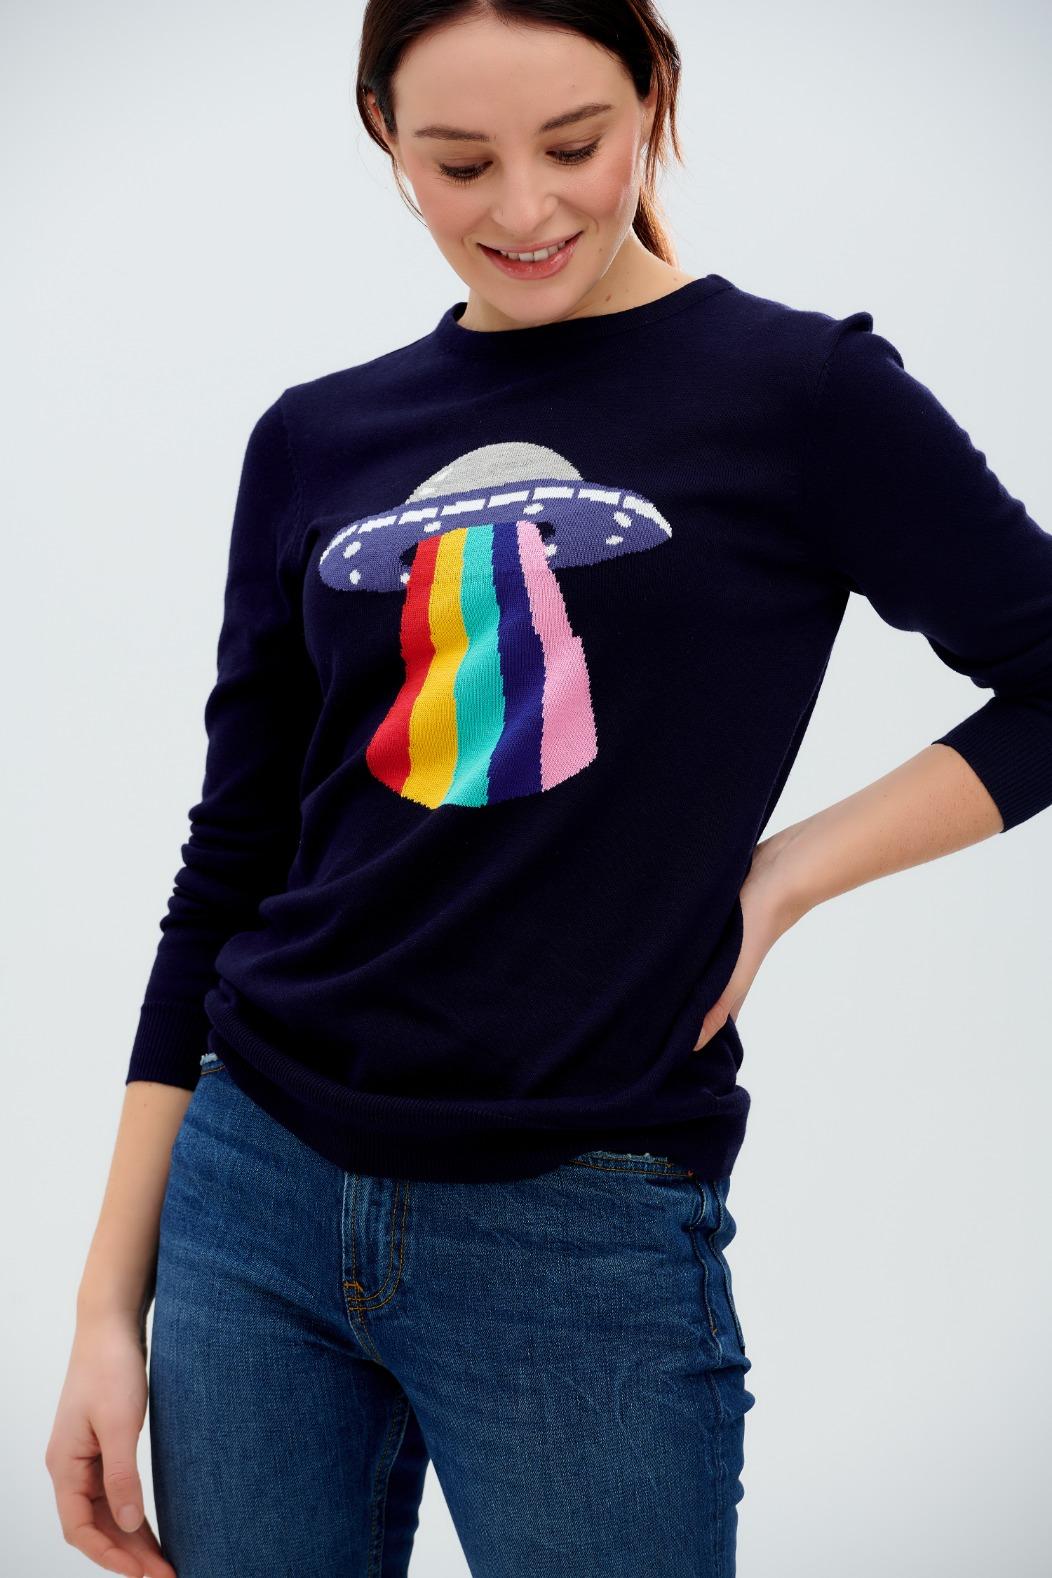 SUGARHILL-BRIGHTON-RITA-JUMPER-SWEATER-Pullover-navy-ufo-rainbow-beam